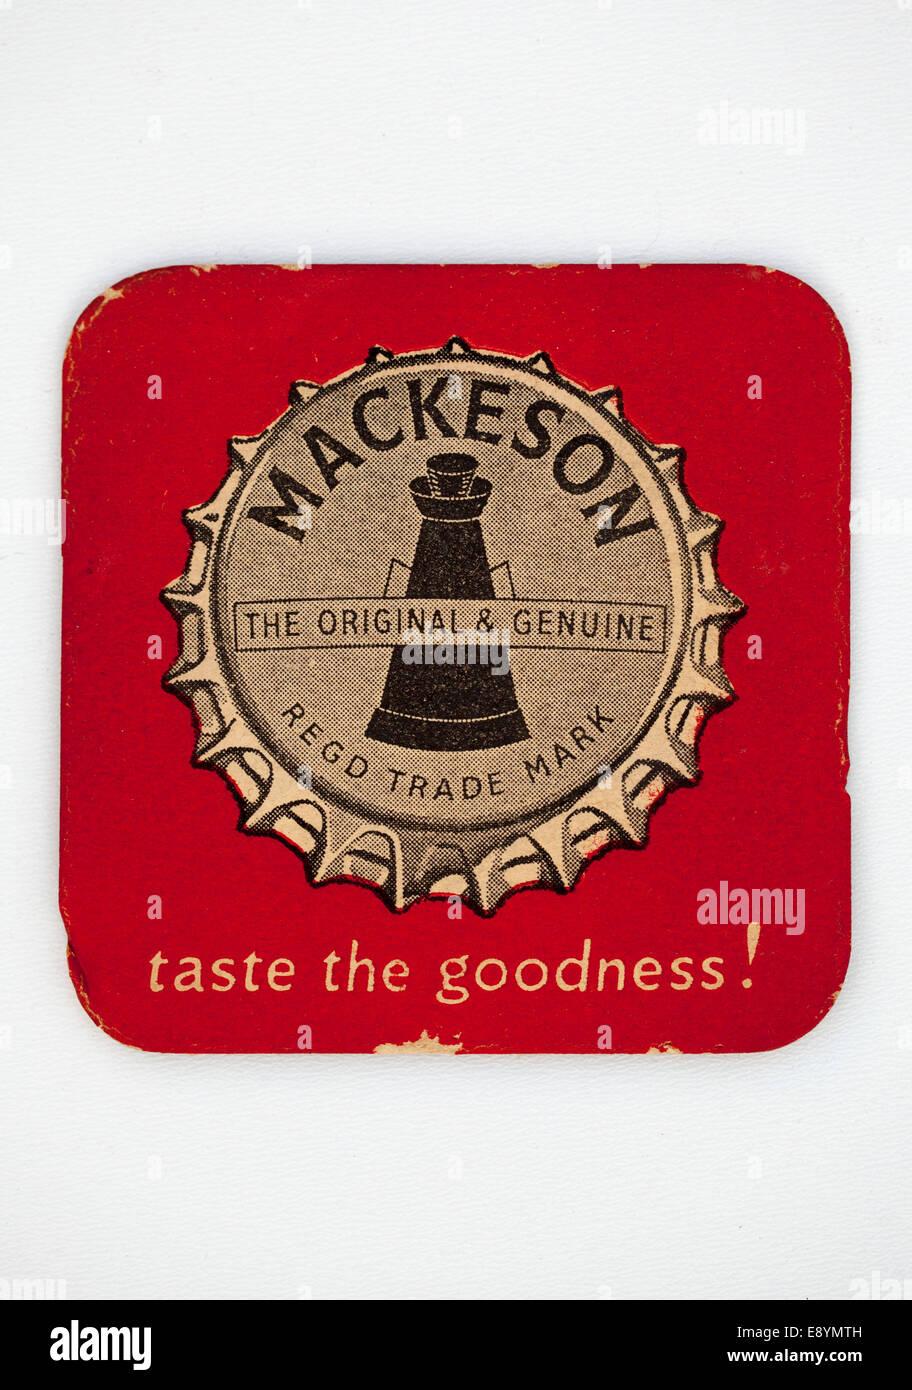 Vintage British Mackeson Beer Mat - The Original and Genuine - Taste the Goodness - Stock Image